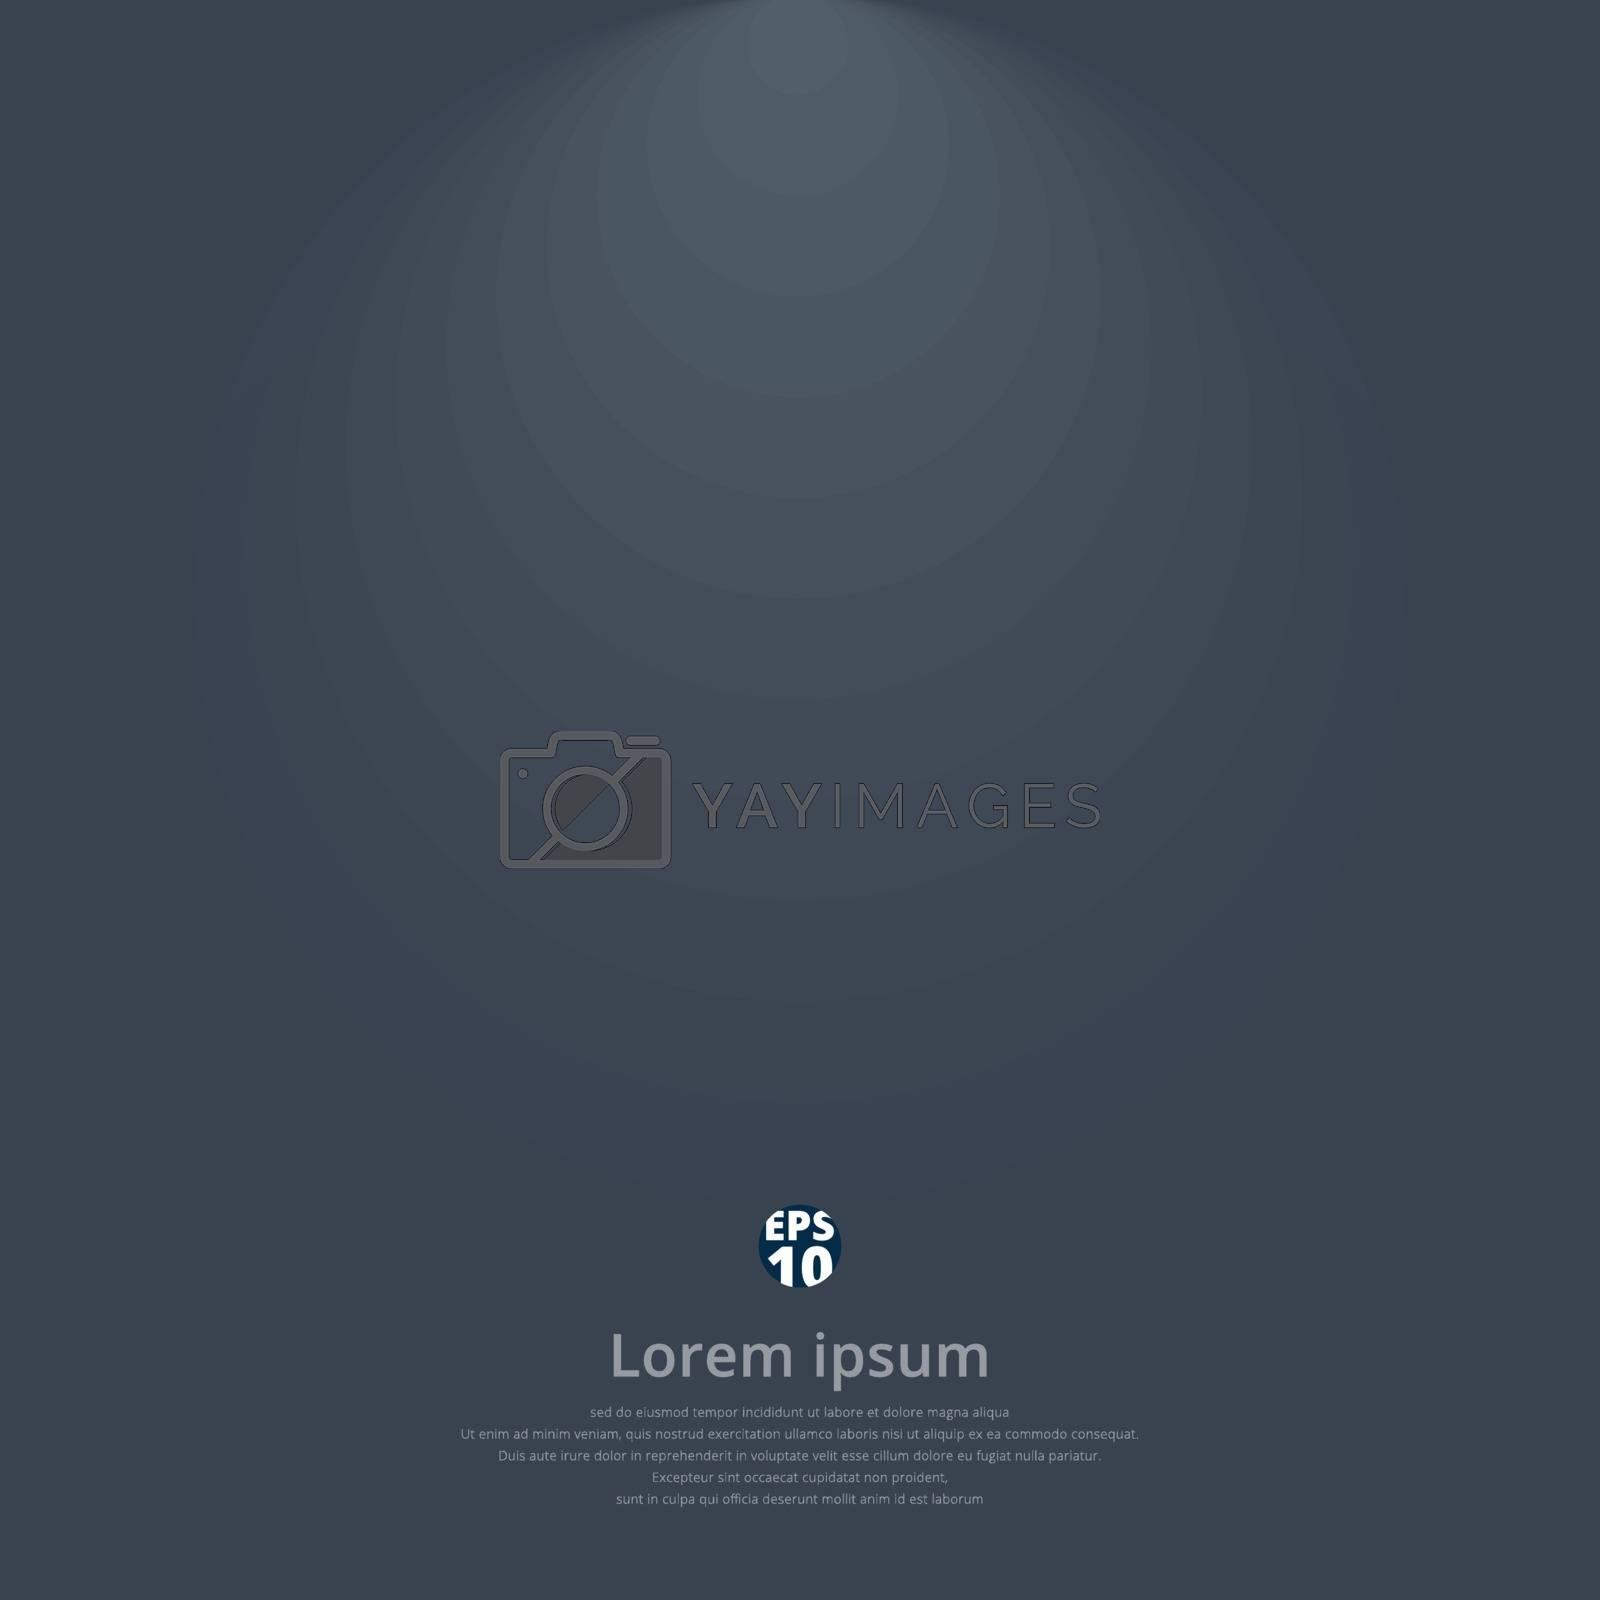 Dark gray gradient vector modern elegant with lighting on top of background. Vector illustration